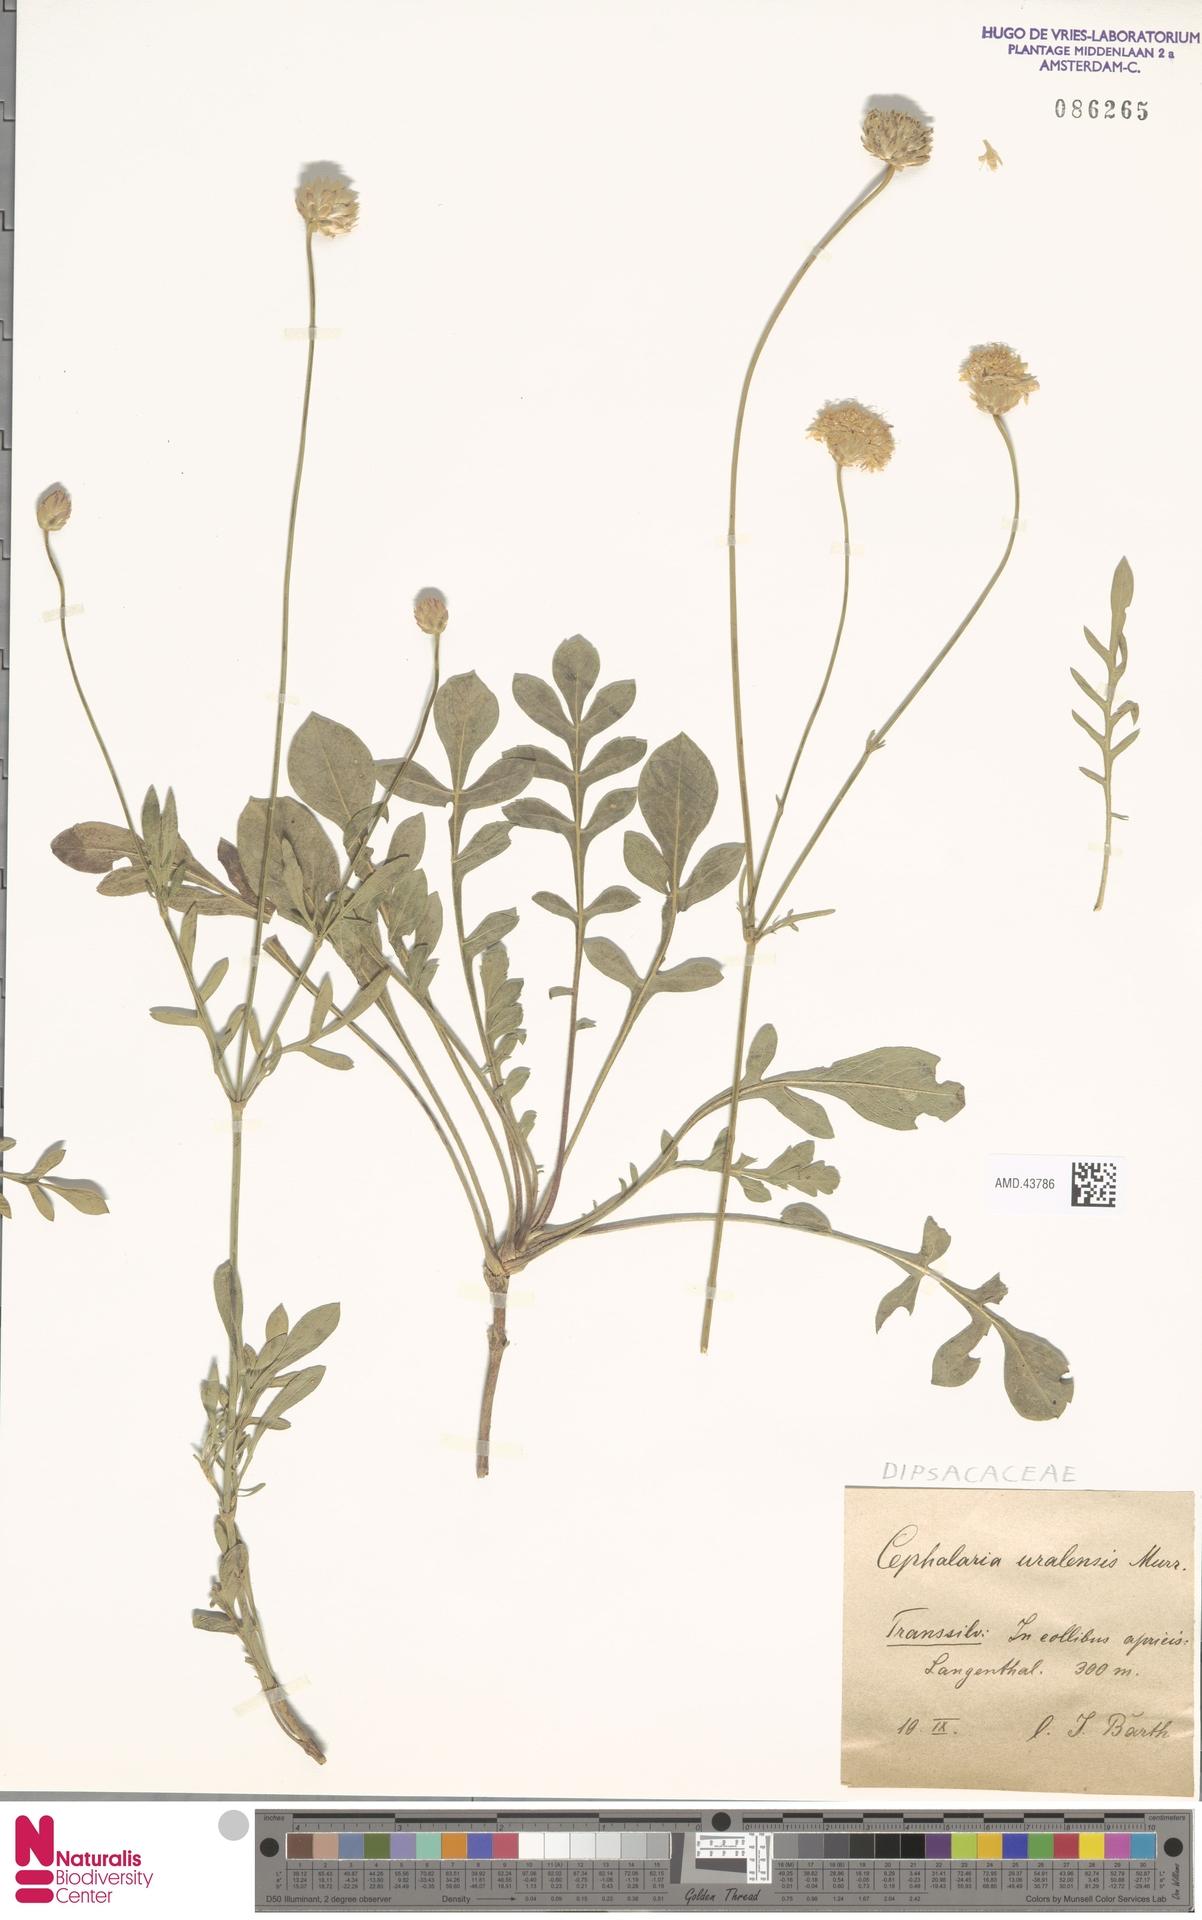 AMD.43786 | Cephalaria uralensis (Murray) Roem. & Schult.